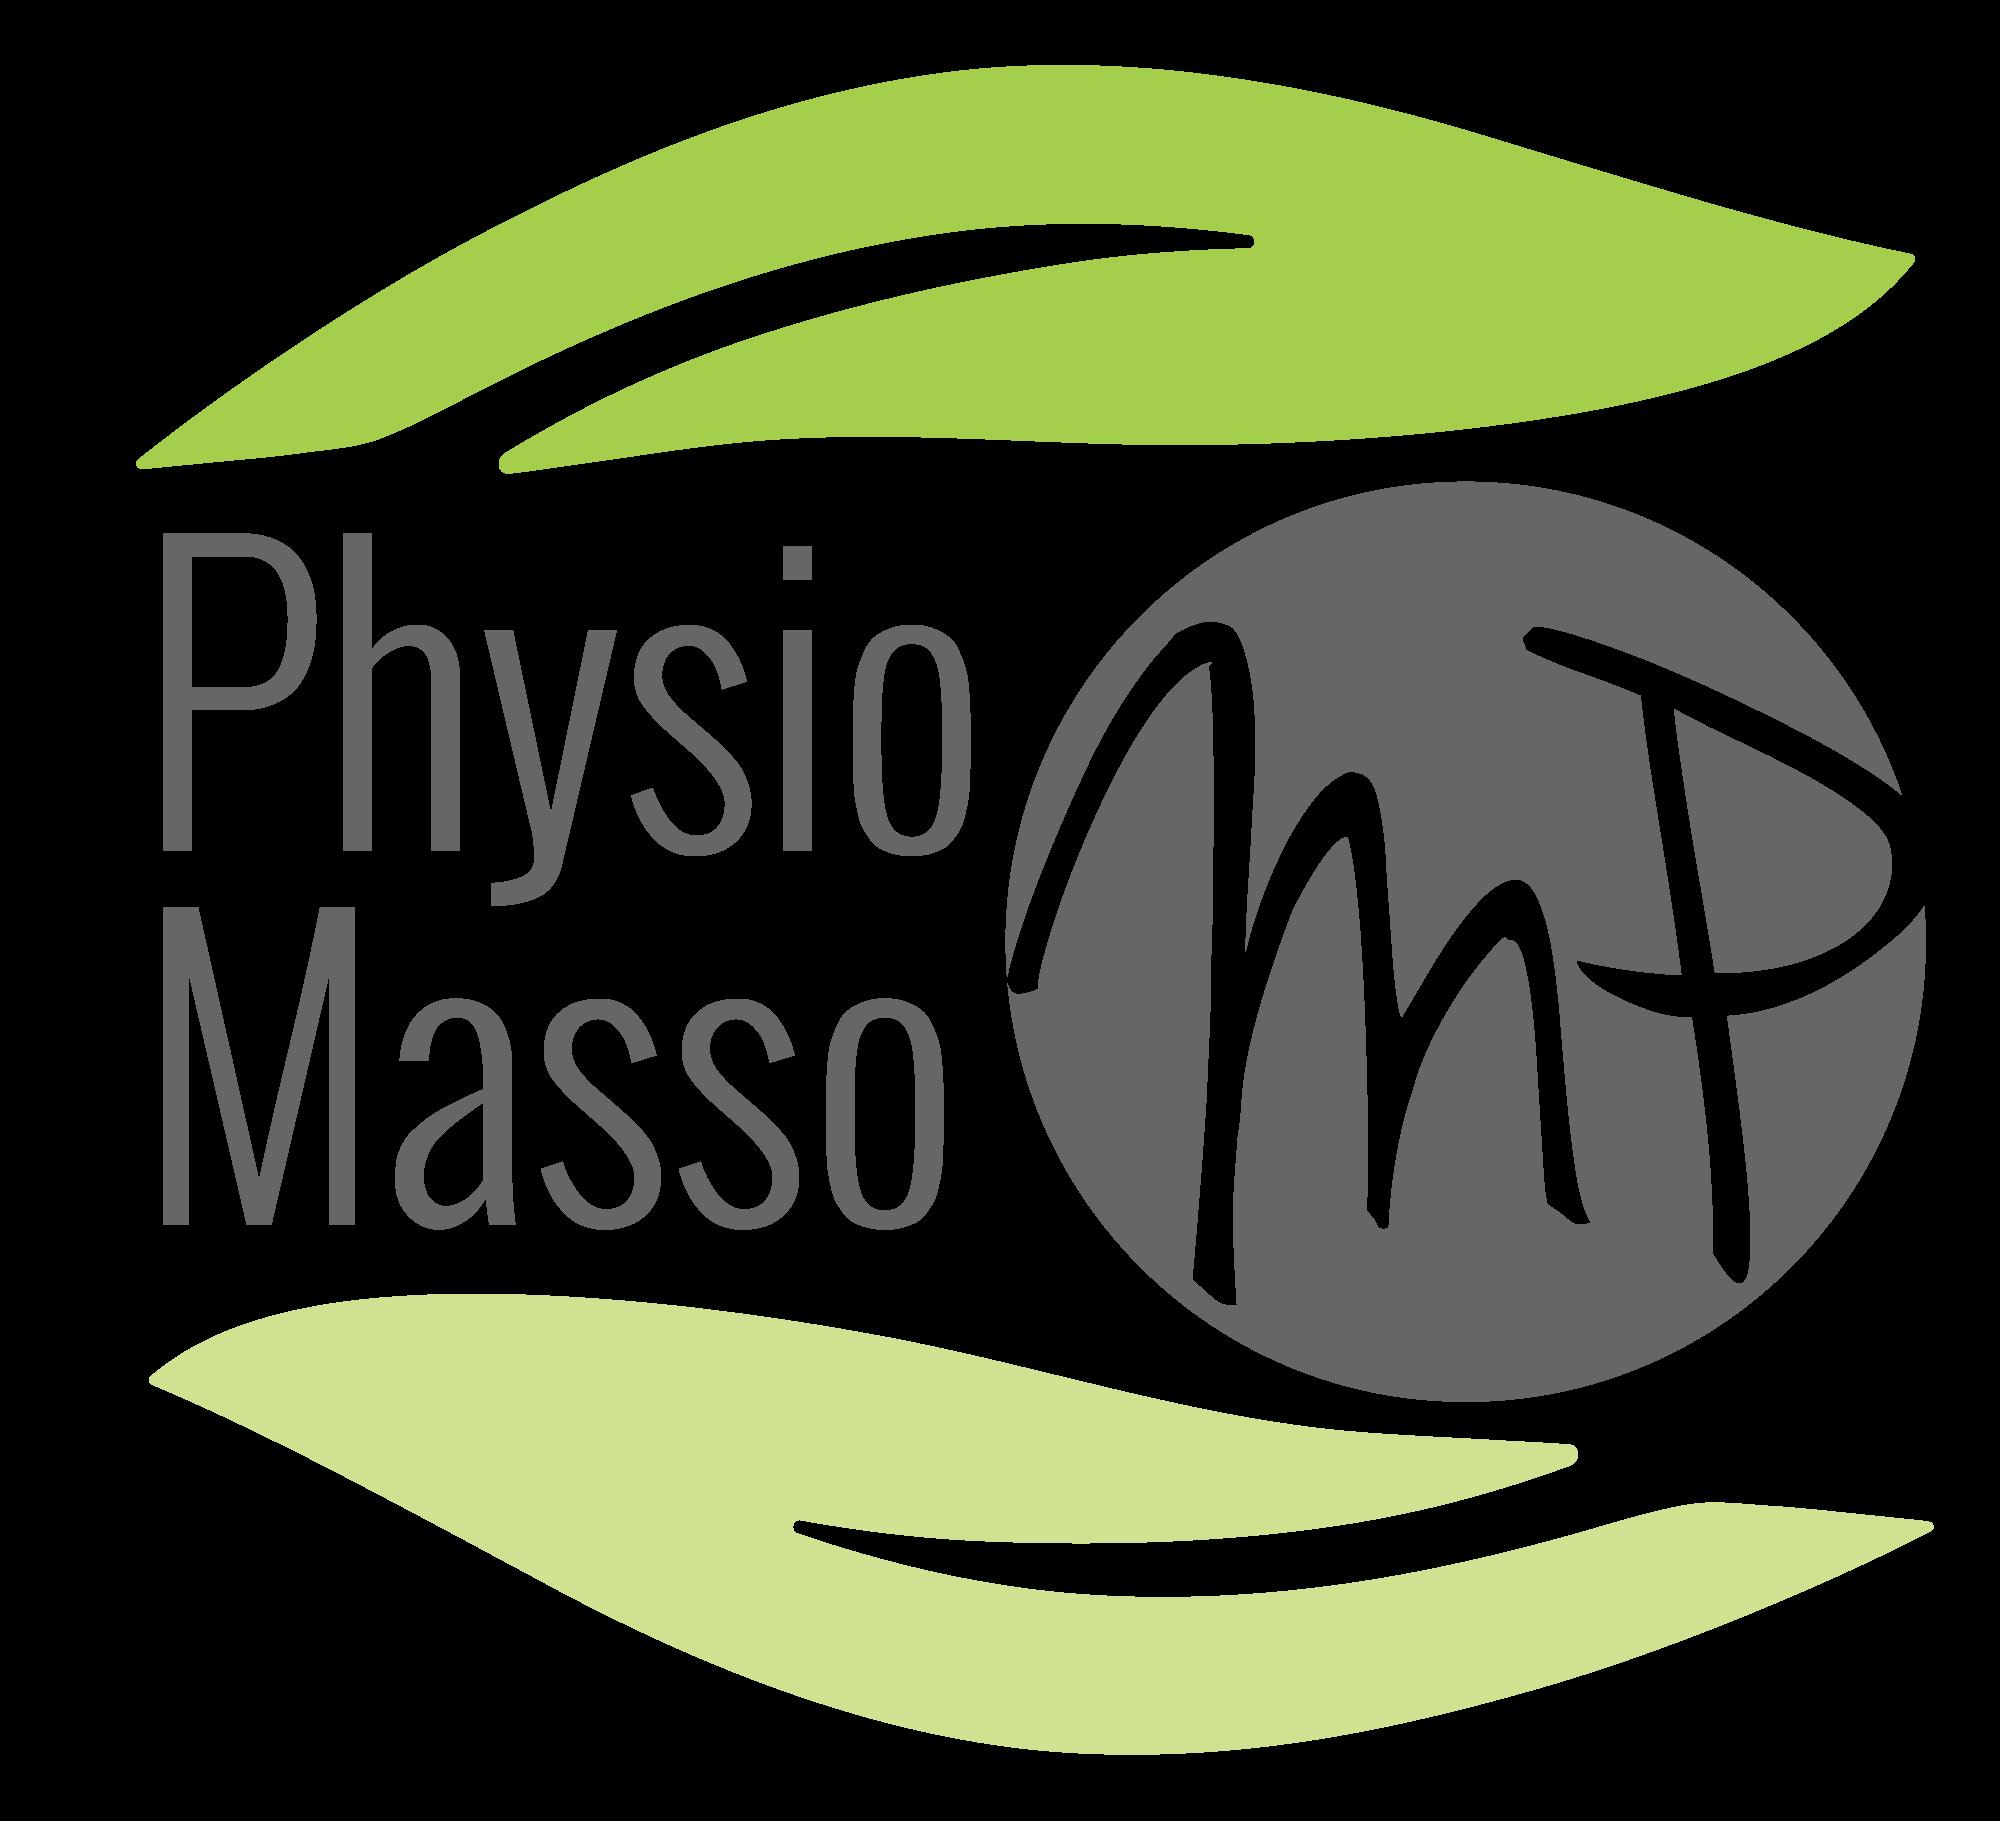 Physio-Masso MP